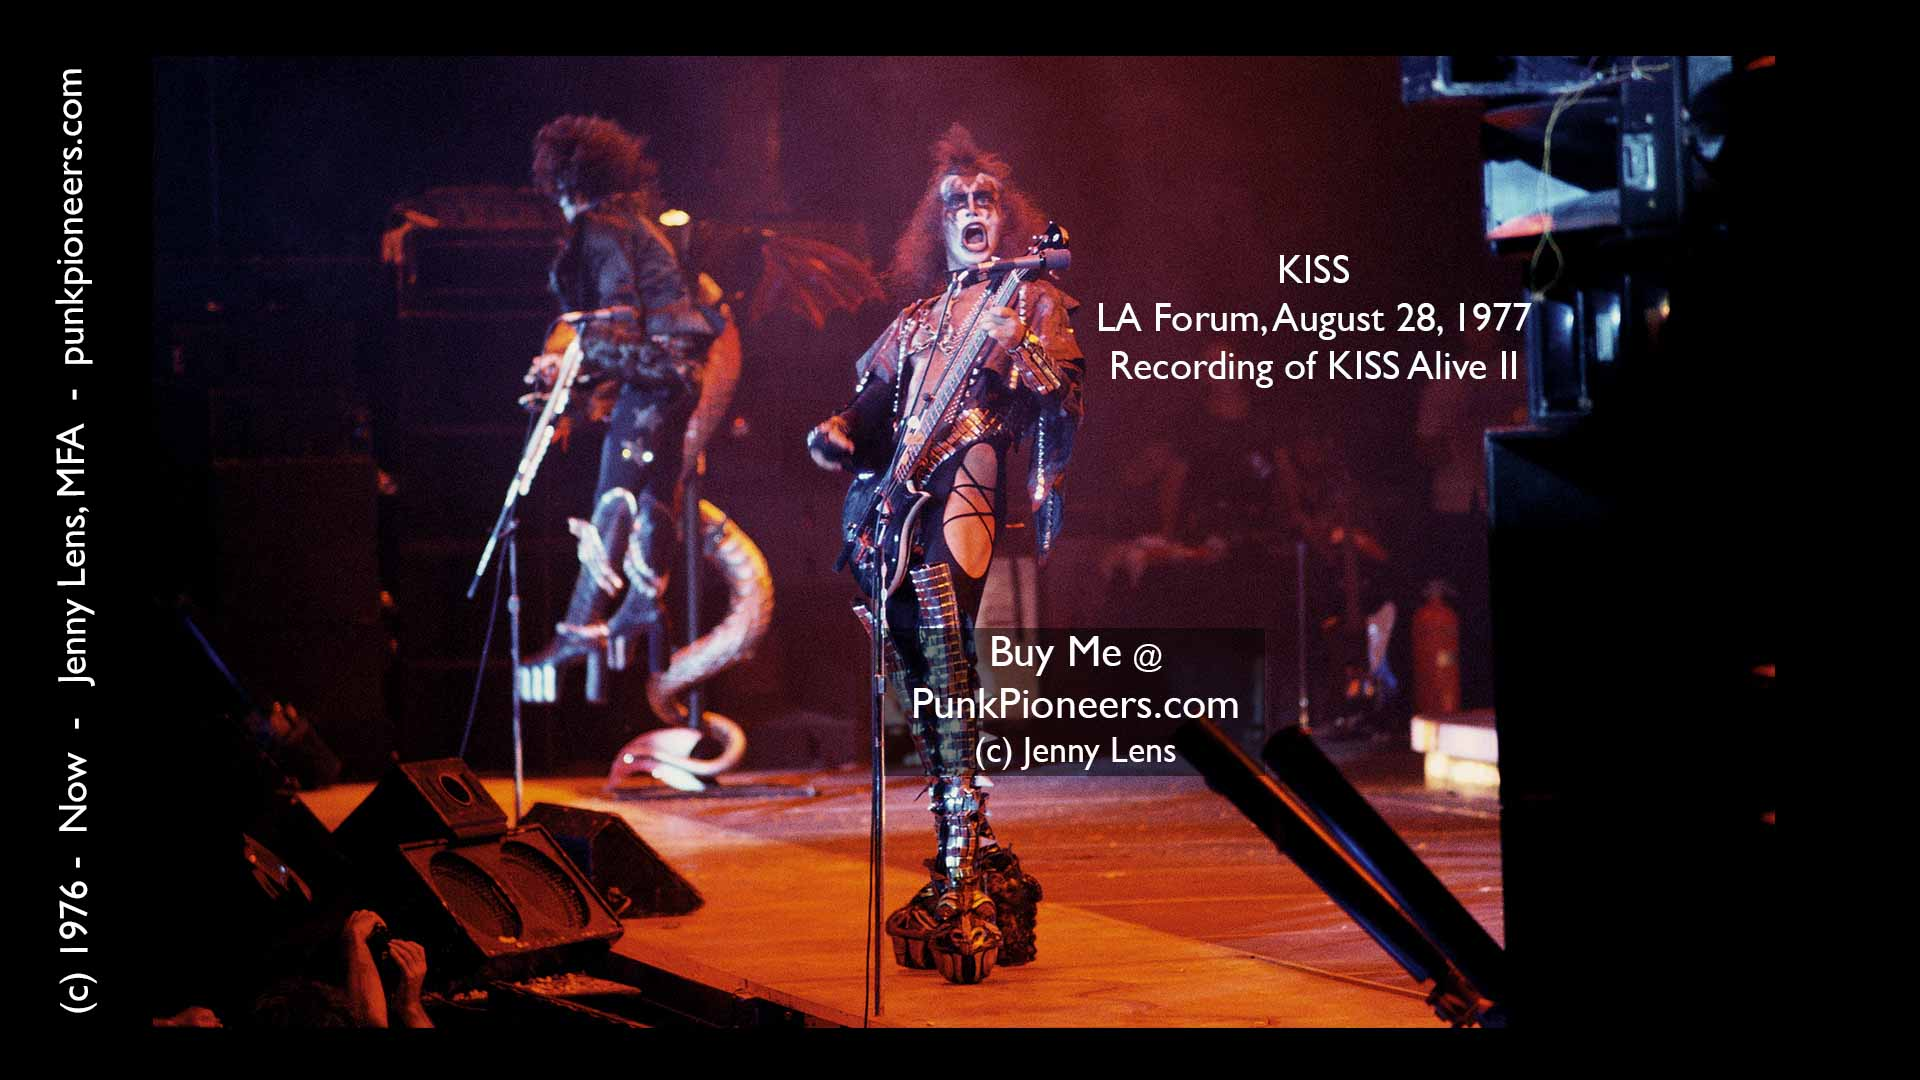 KISS, LA Forum, August 28, 1977, recording of KISS Live II, Jenny Lens, PunkPioneers.com